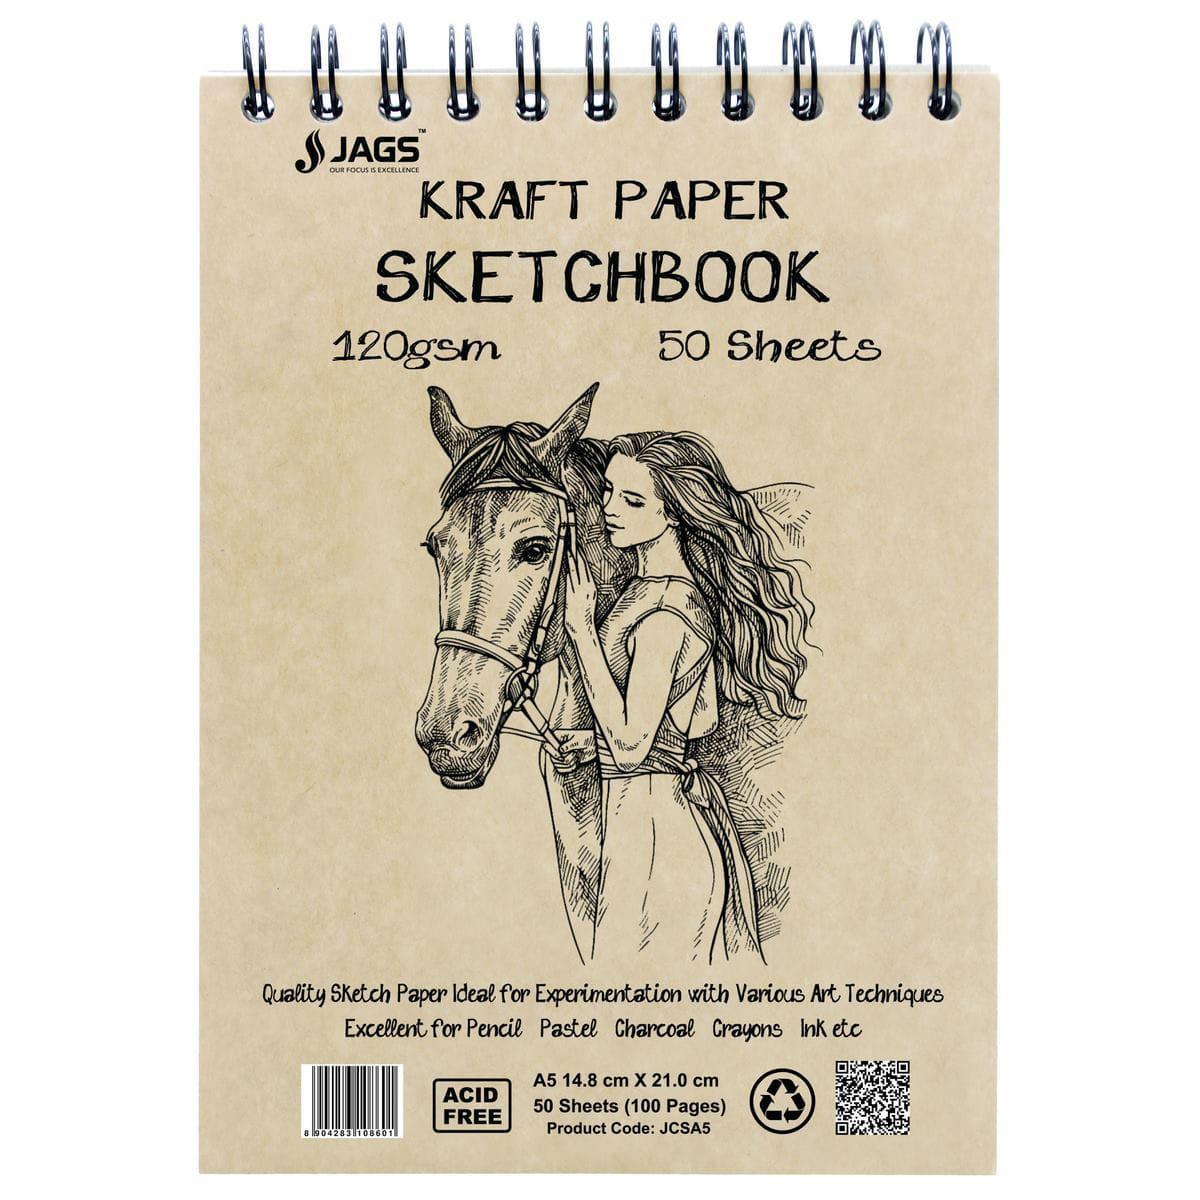 A5 Kraft Paper Sketchbook